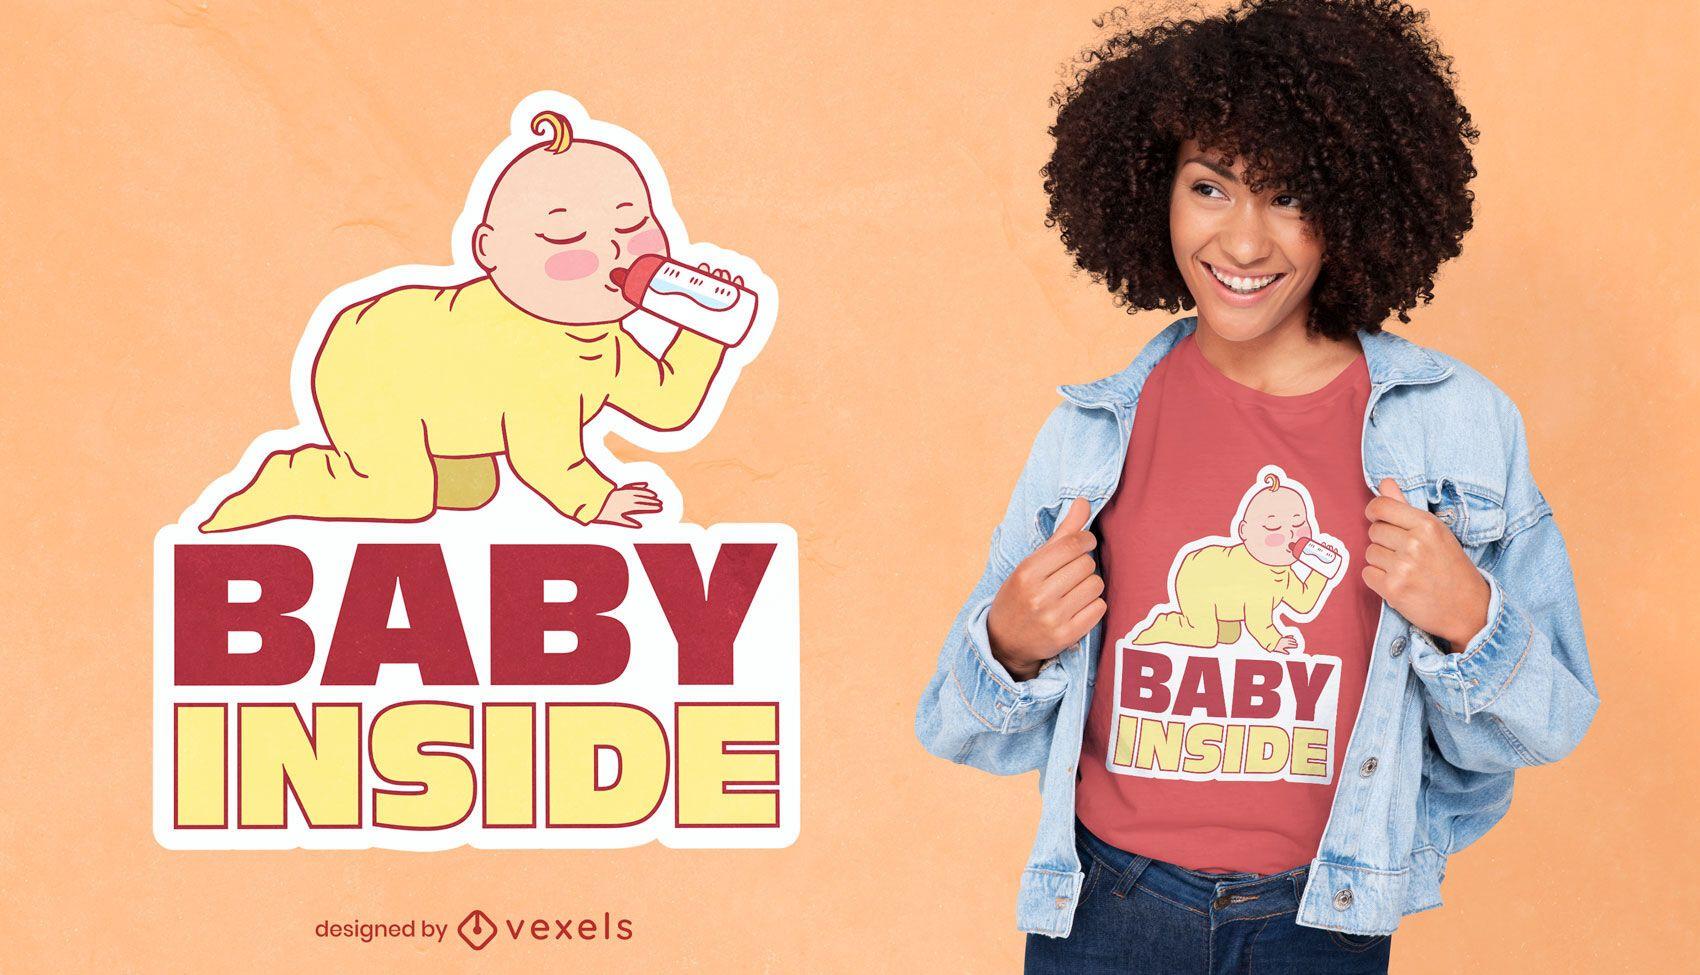 Baby inside pregnancy t-shirt design